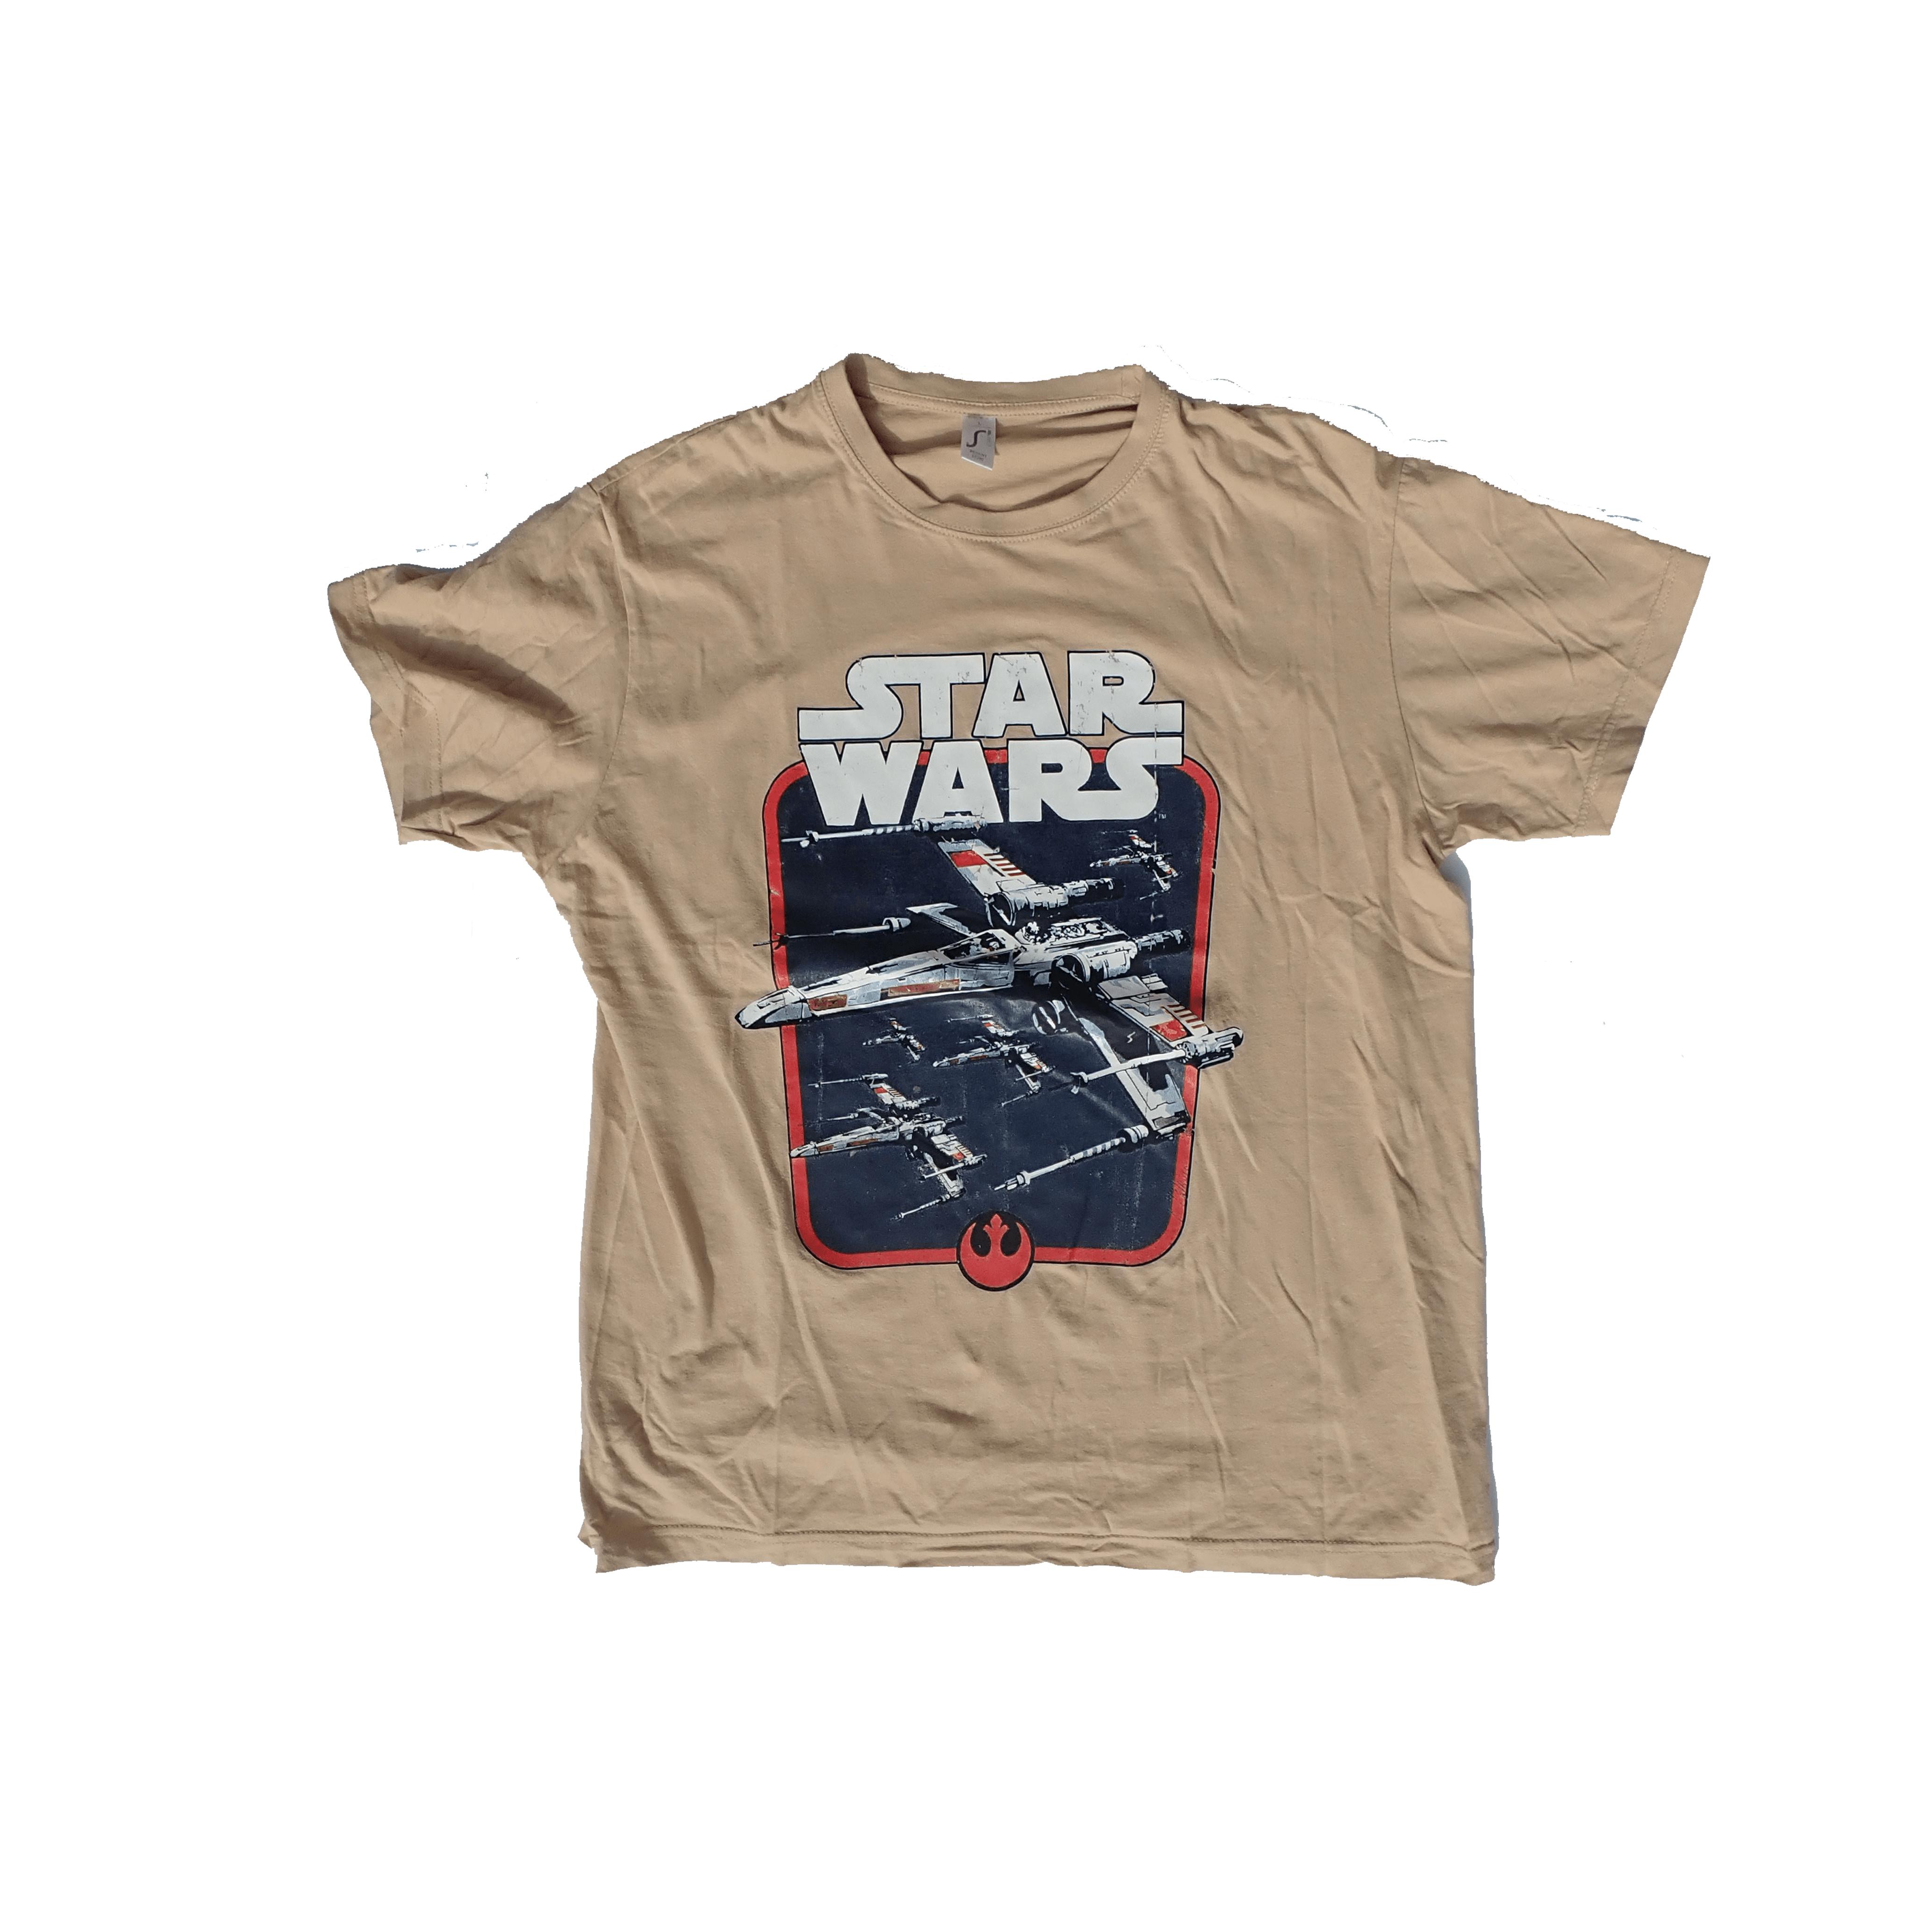 Star Wars Vintage Style Tshirt